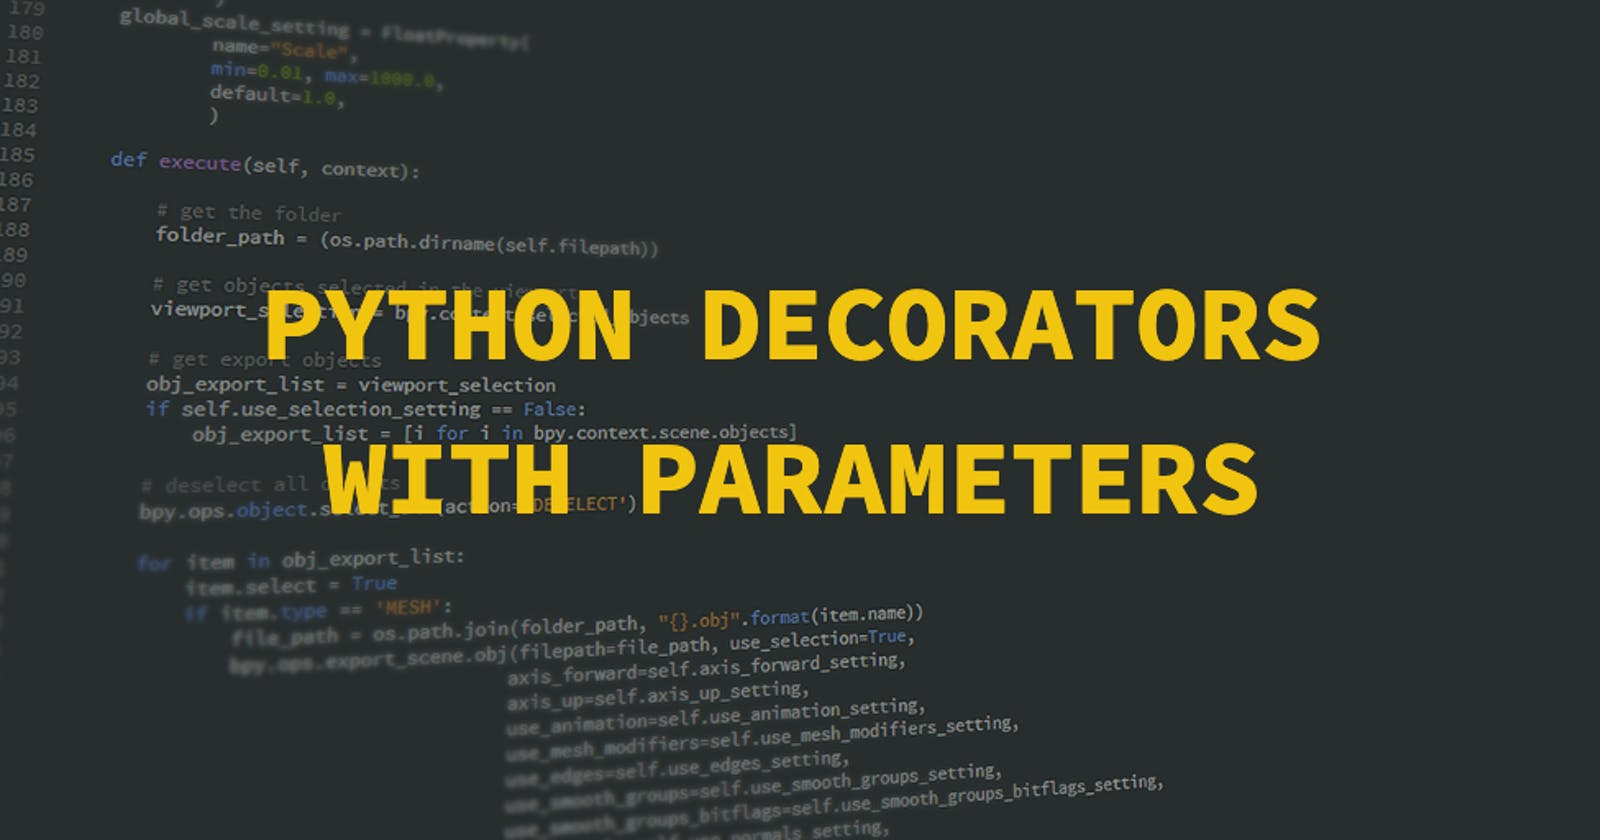 Python decorators with parameters